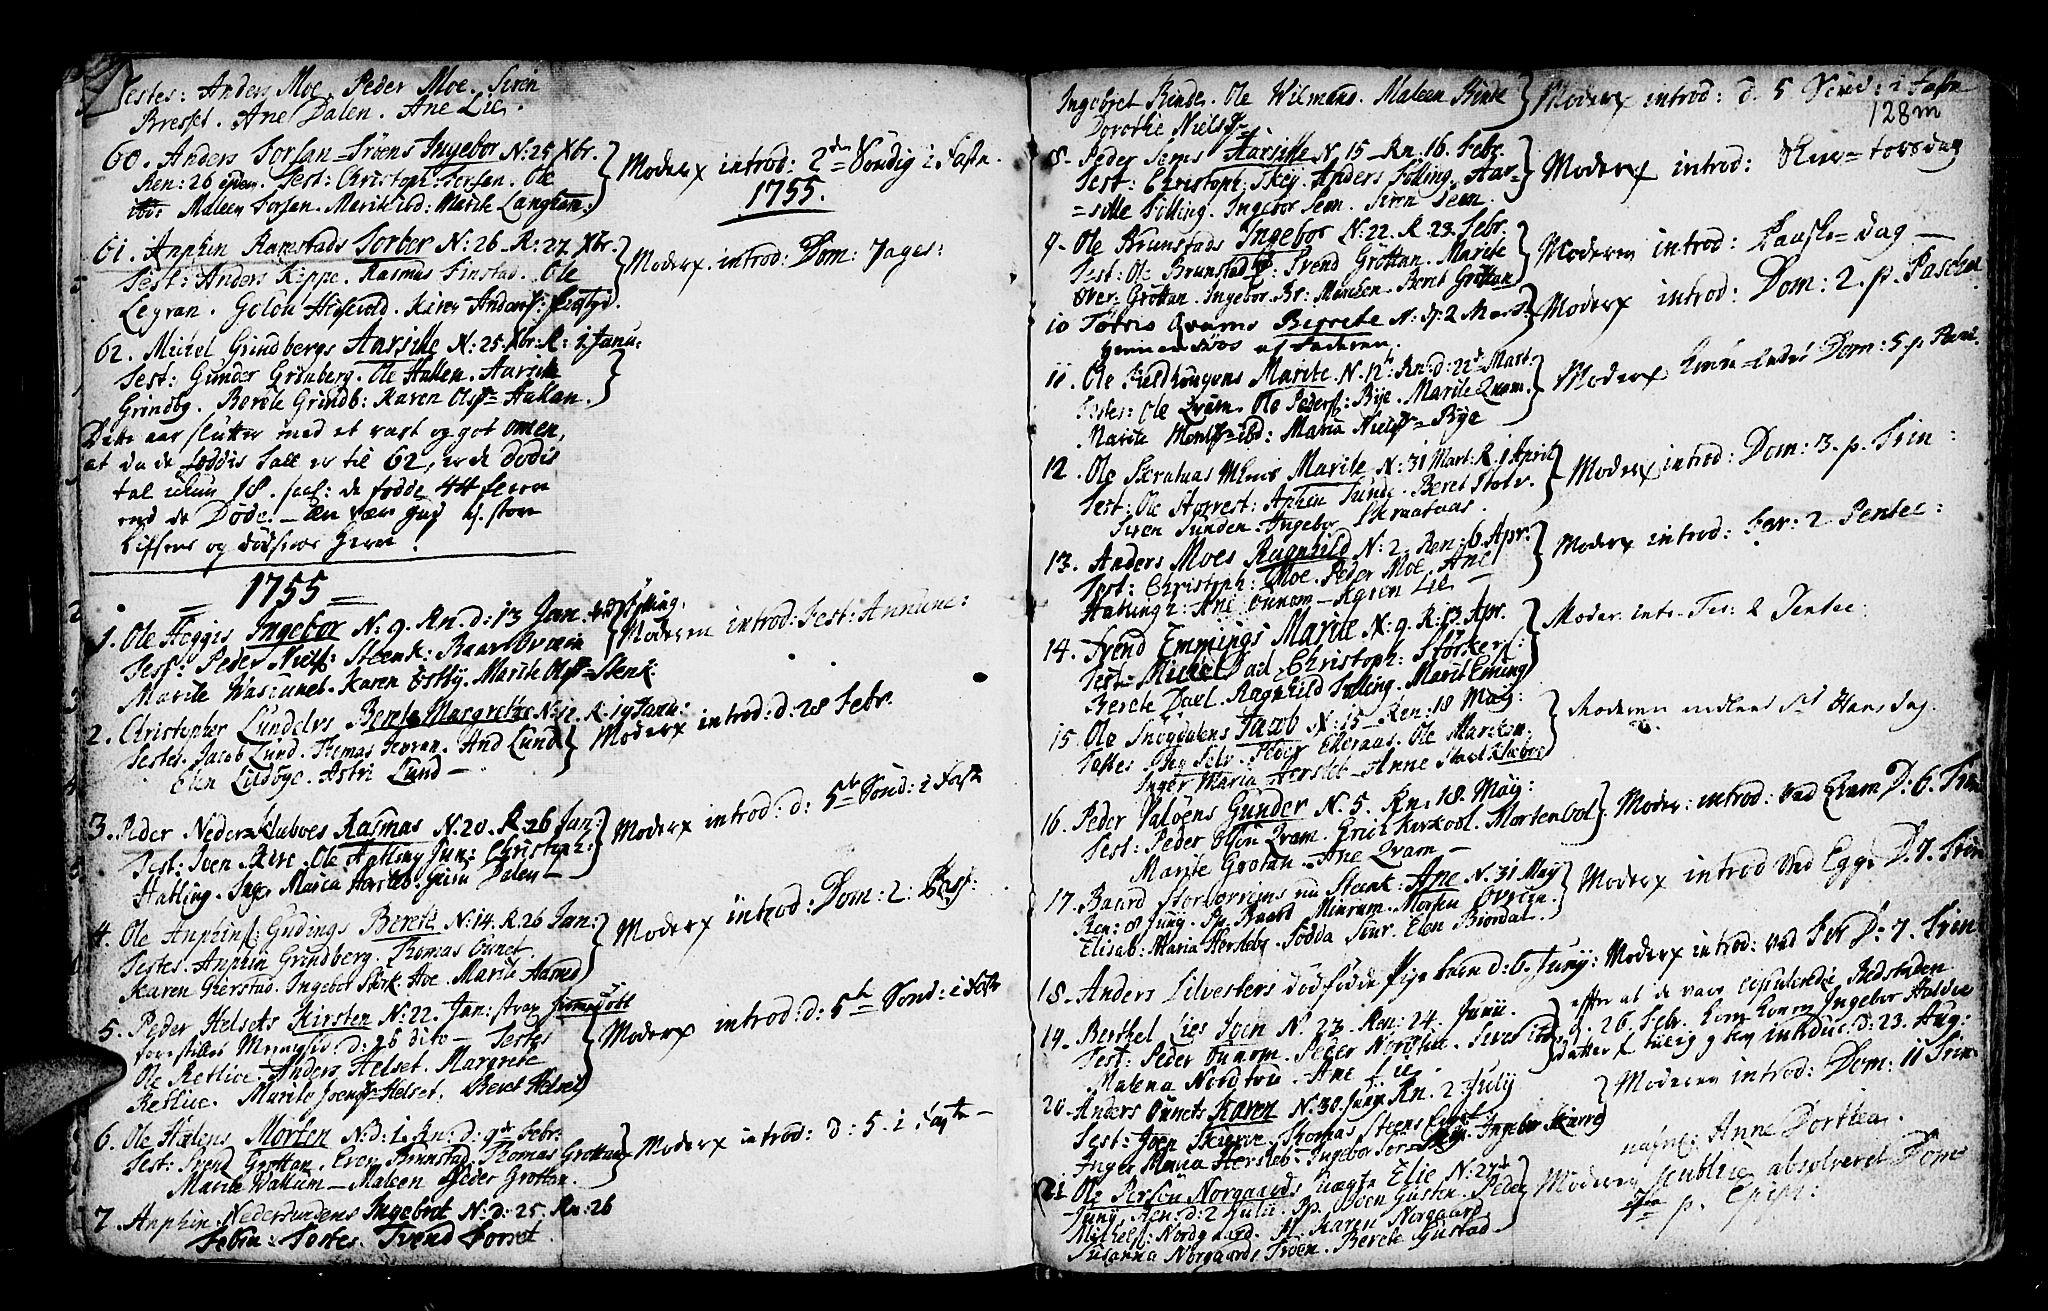 SAT, Ministerialprotokoller, klokkerbøker og fødselsregistre - Nord-Trøndelag, 746/L0439: Ministerialbok nr. 746A01, 1688-1759, s. 128l